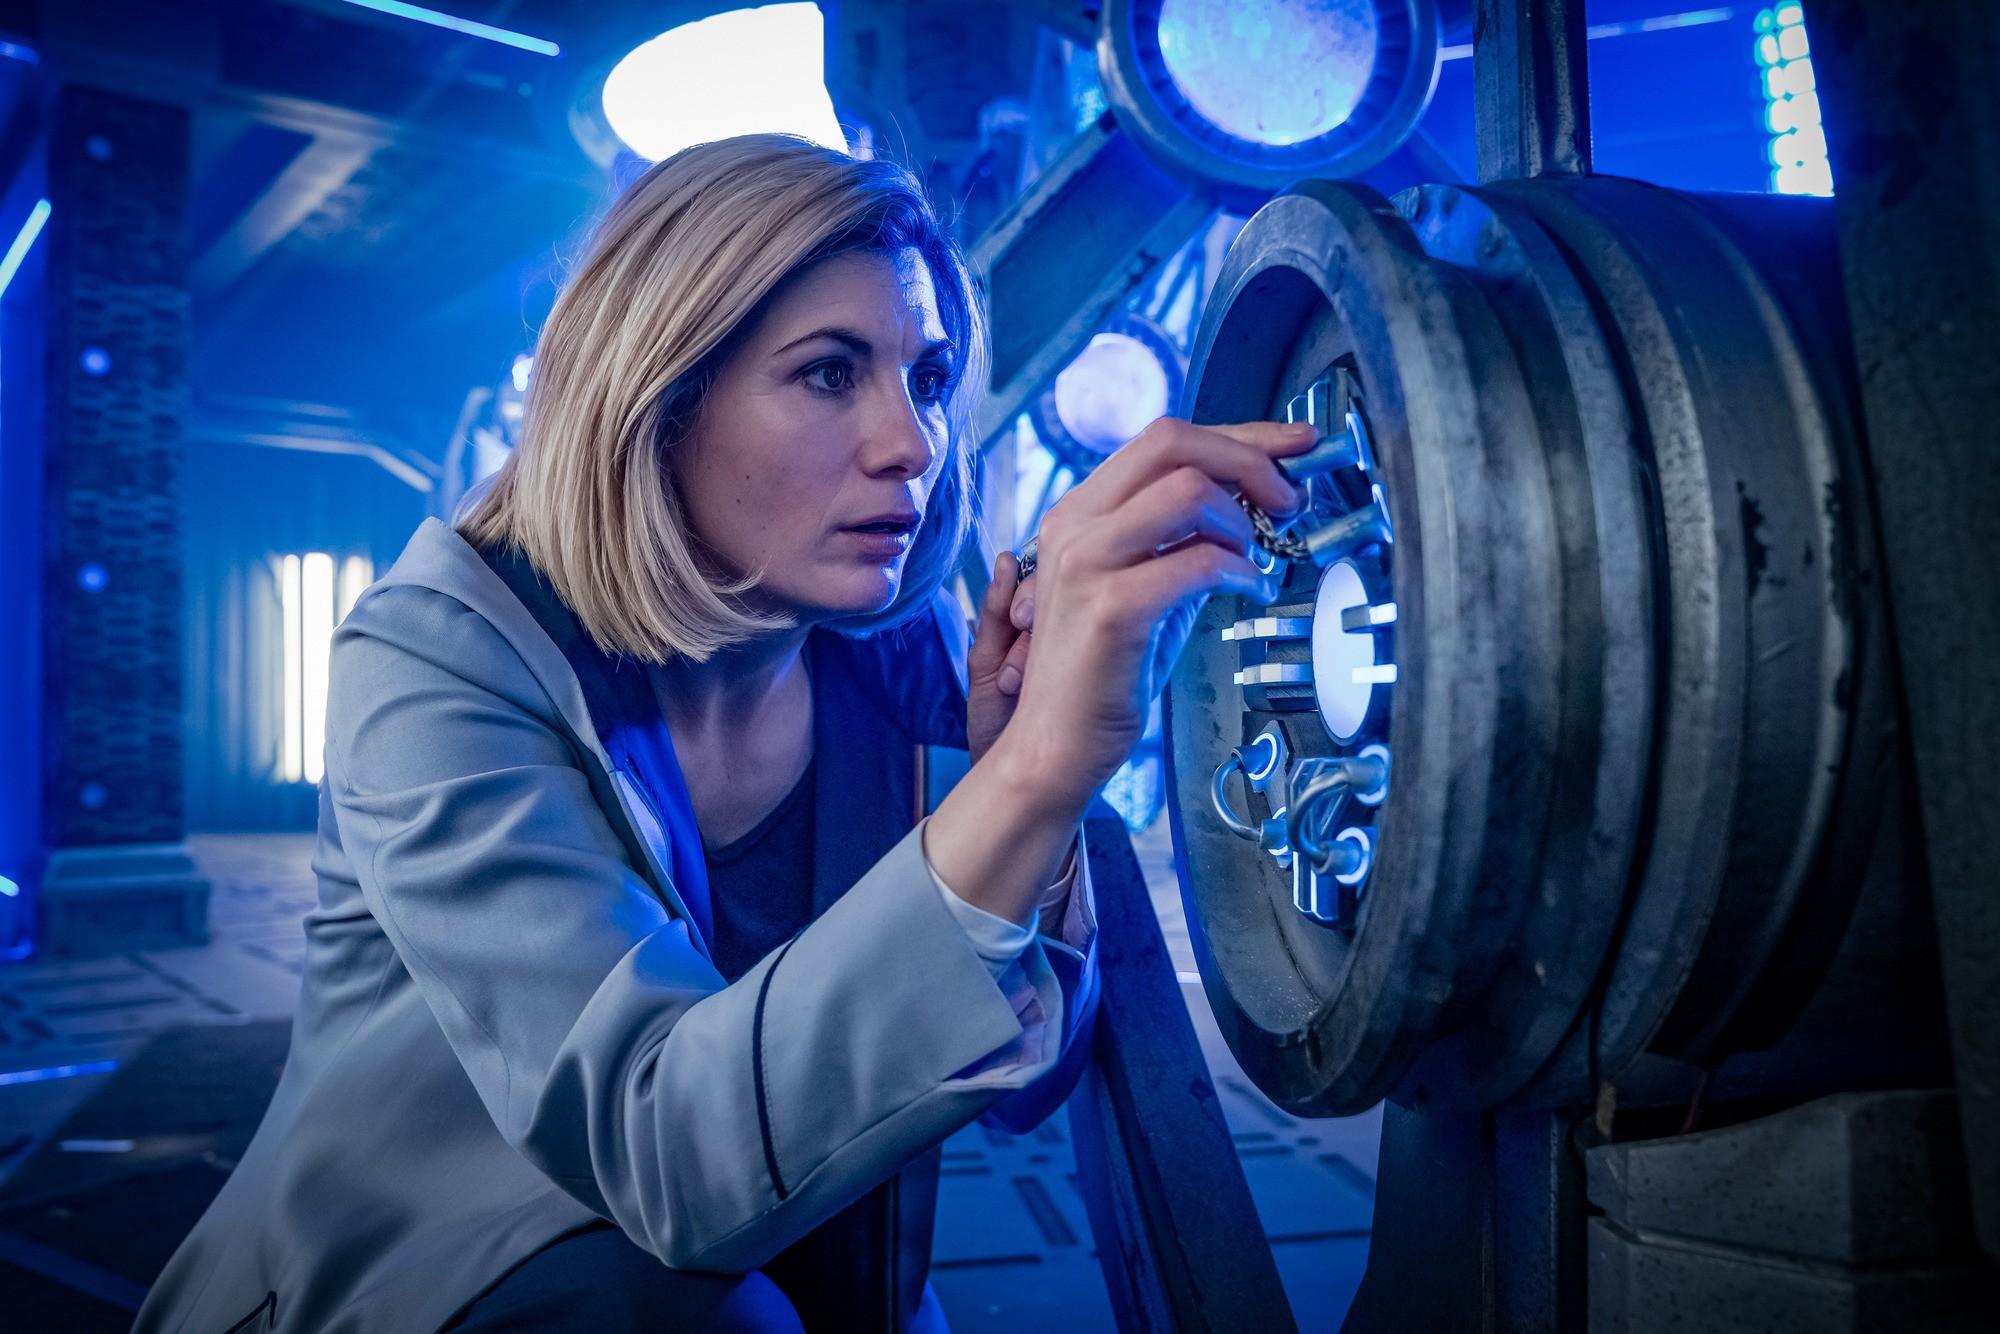 Doctor Who Season 13 update